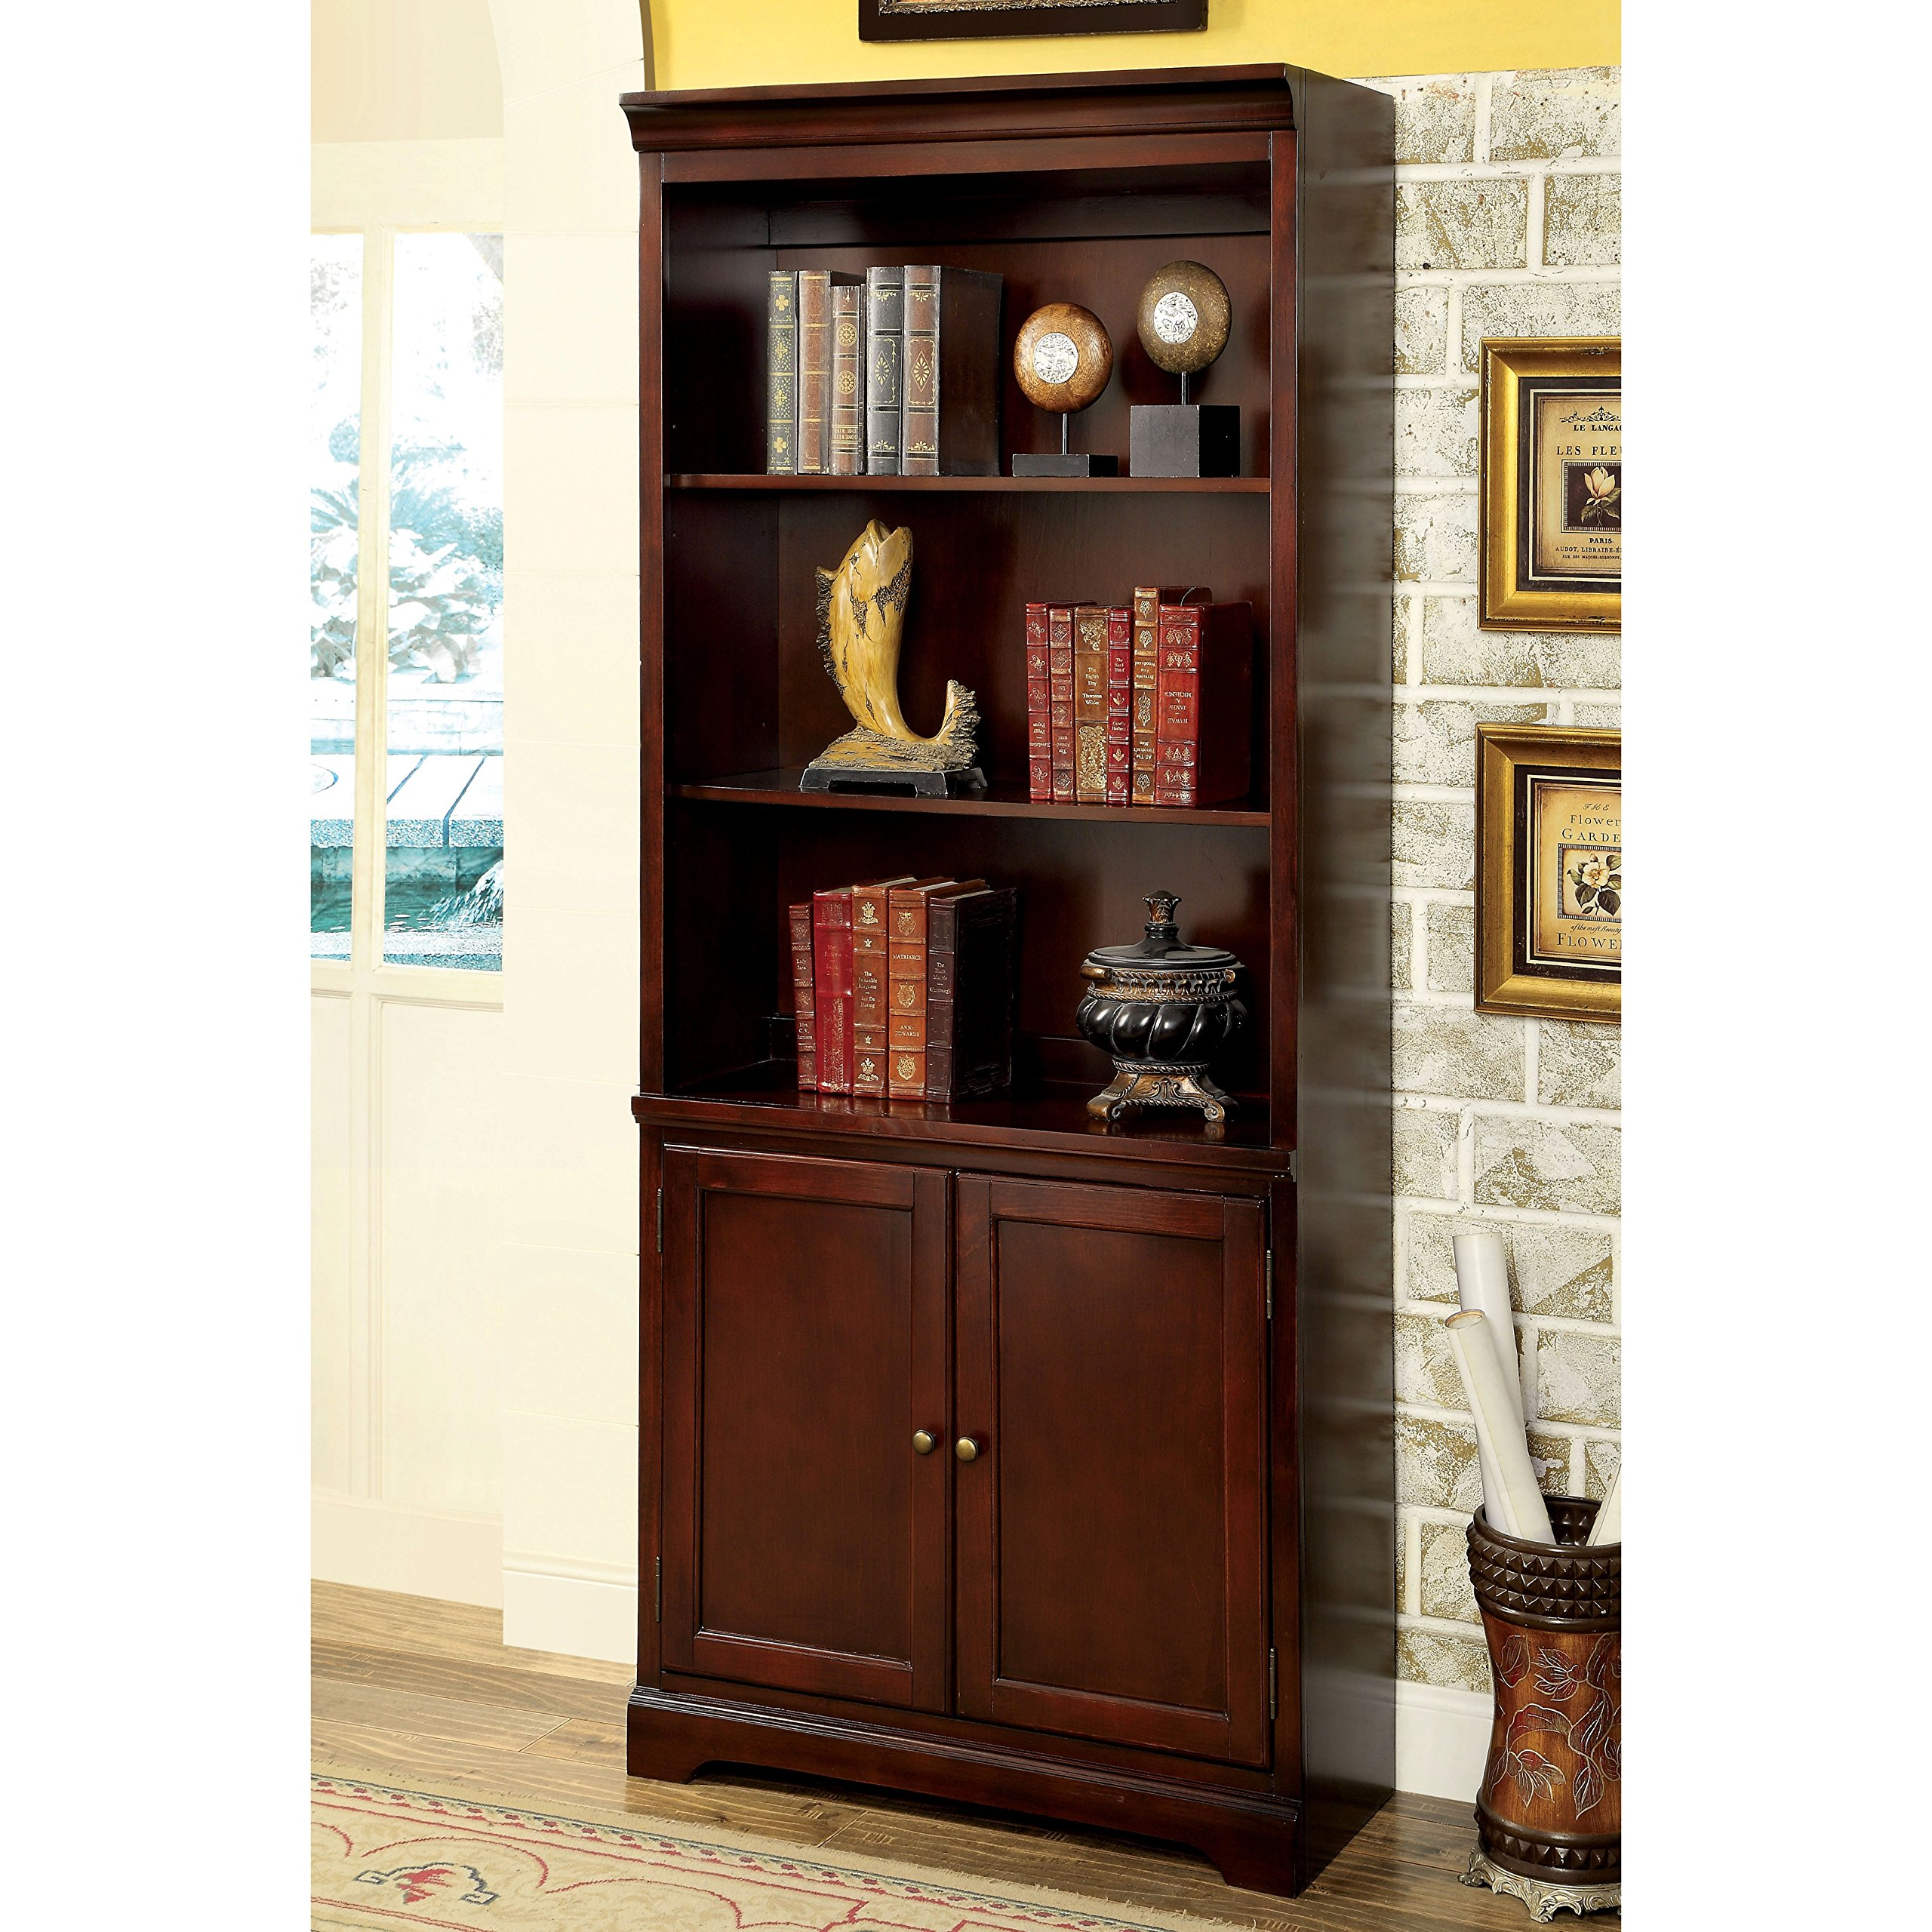 Furniture of America Ericks Transitional Cherry Bookshelf by Furniture of America